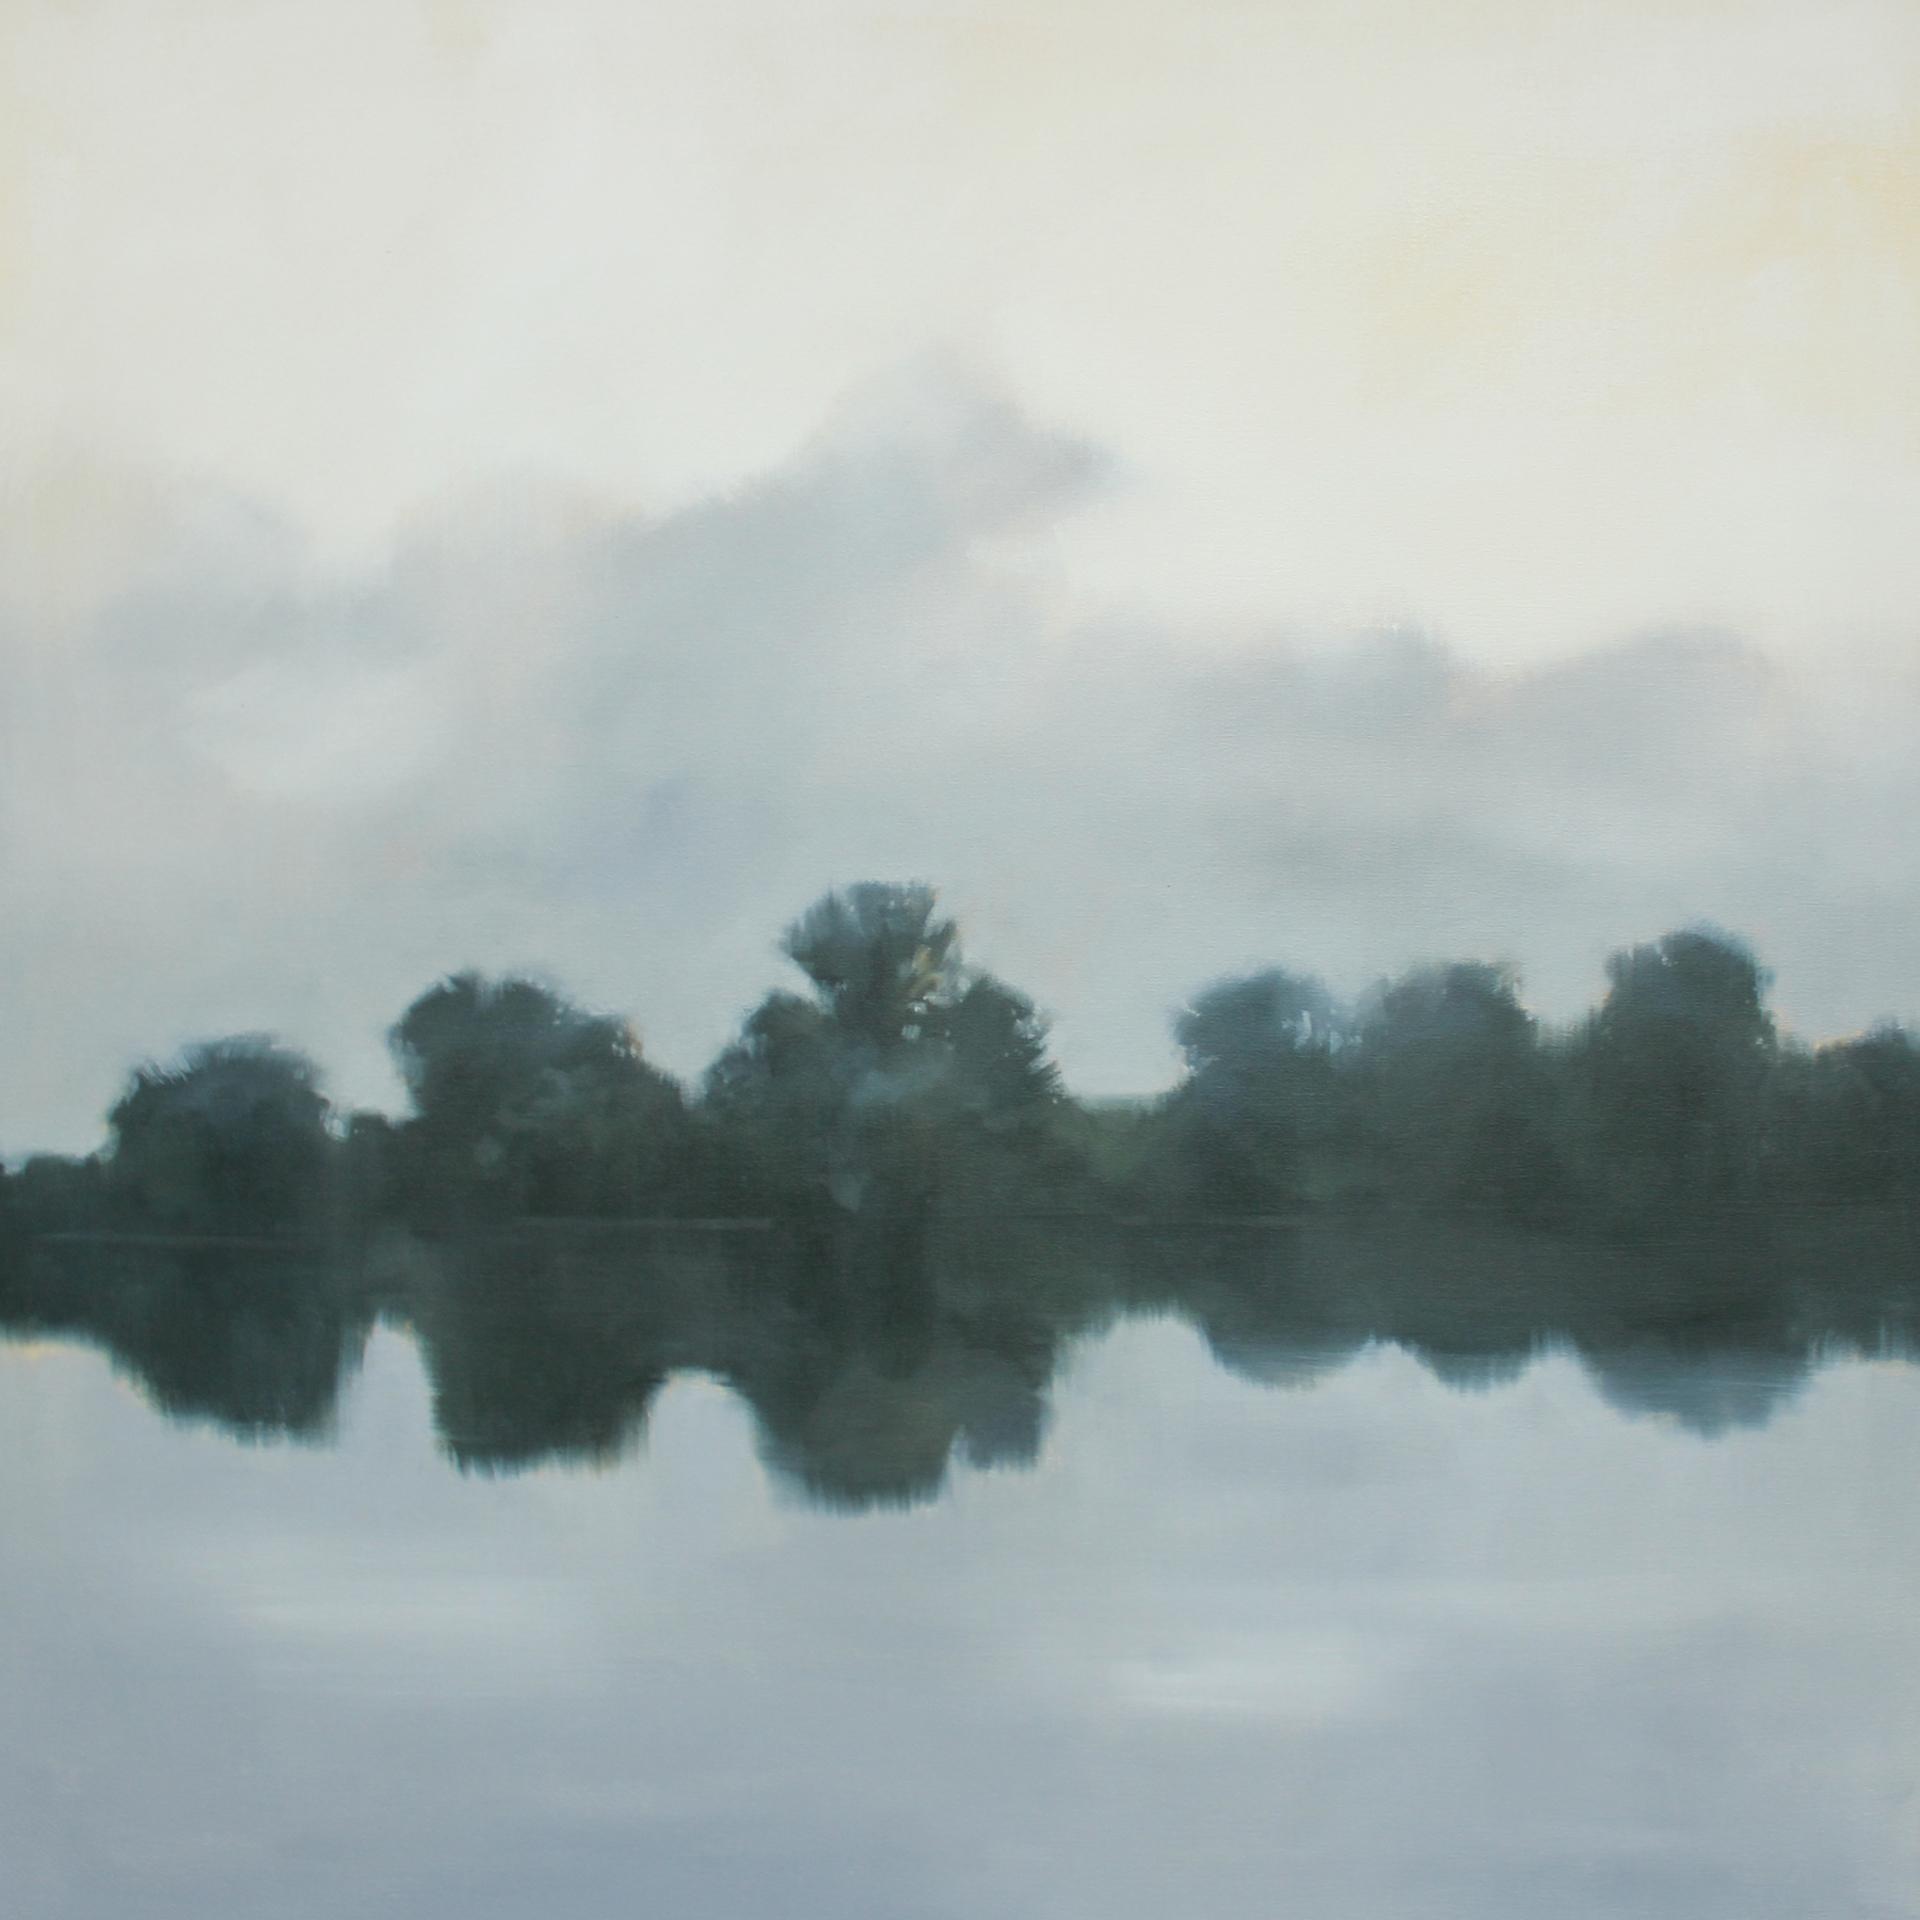 Water Crossing by Megan Lightell